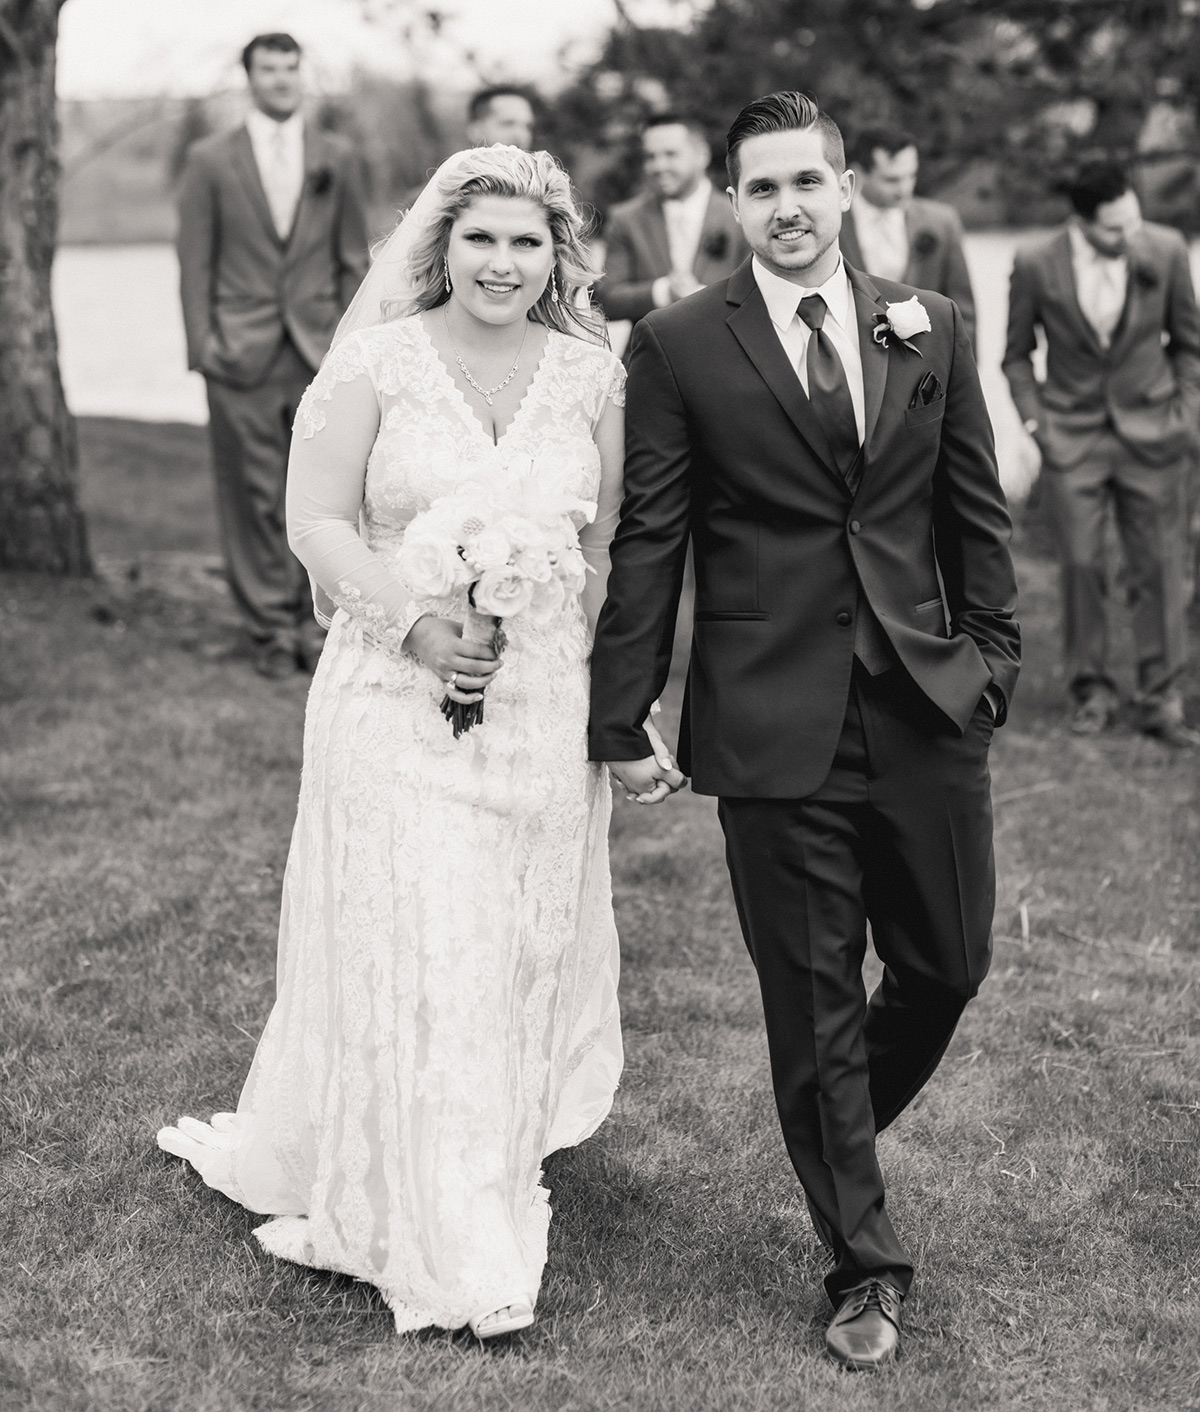 Olivia and Zac -Wedding Photographer - WatersEdge Event Center